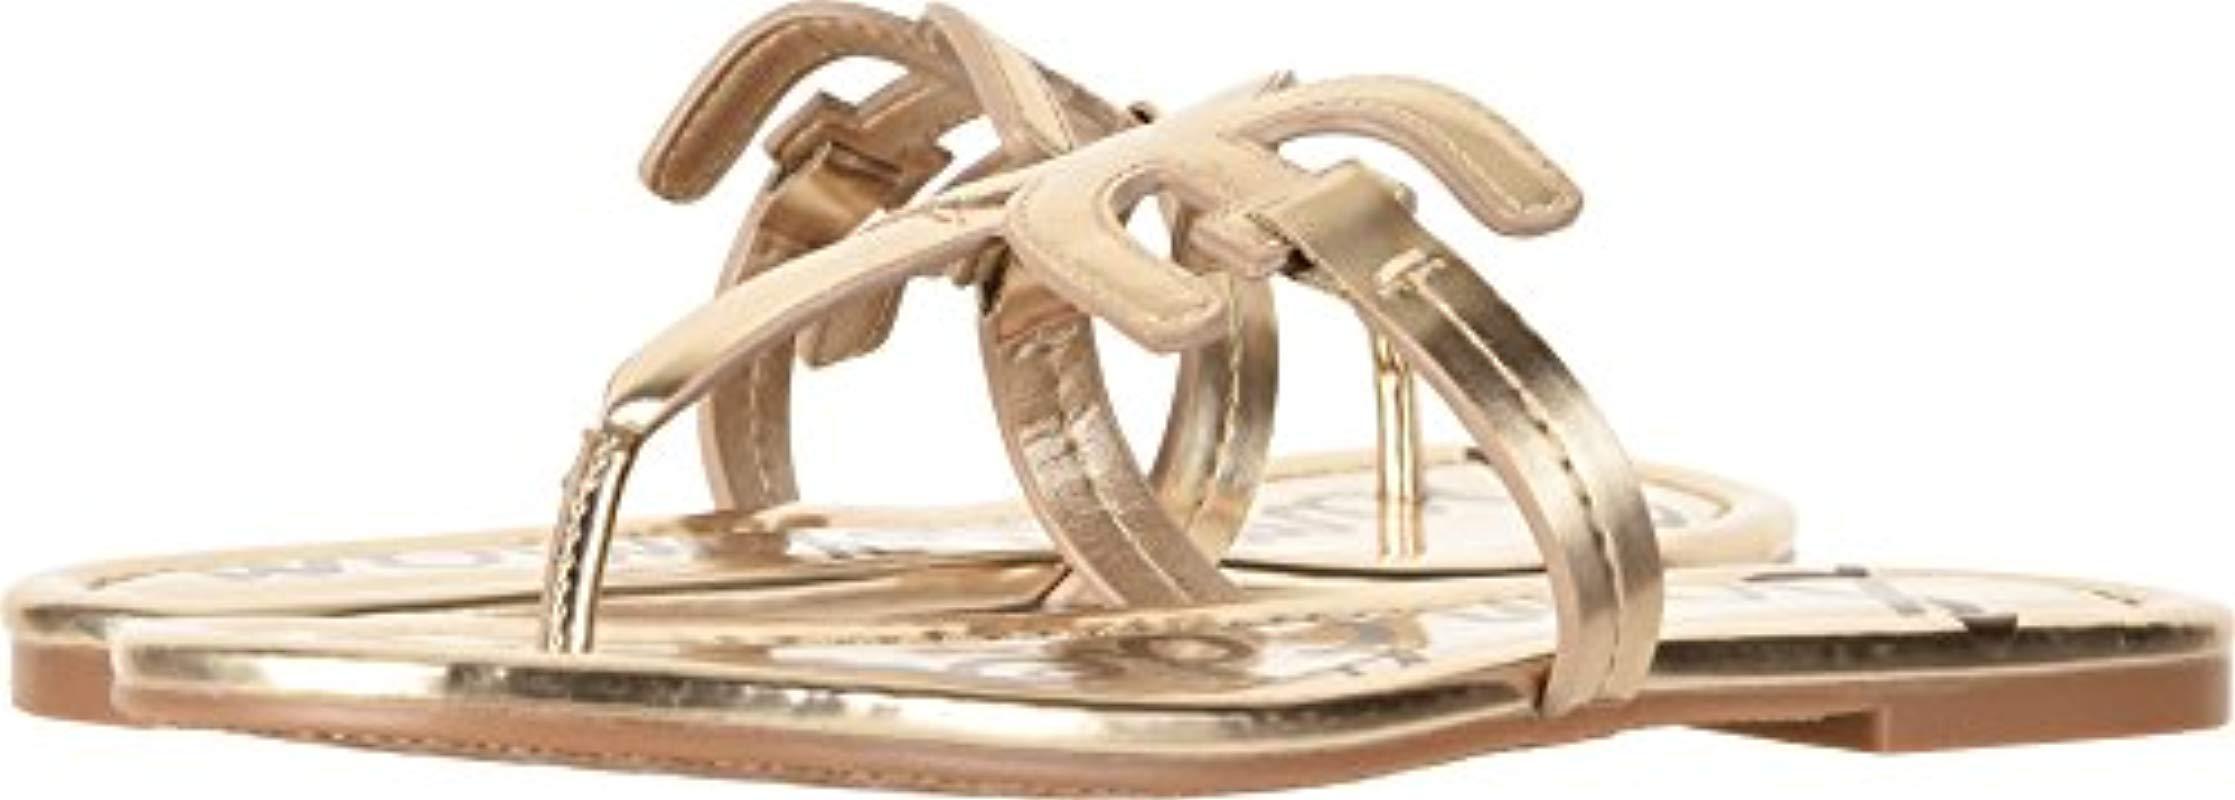 70557c4afbc Lyst - Sam Edelman Carter Flat Sandal in Metallic - Save 31%